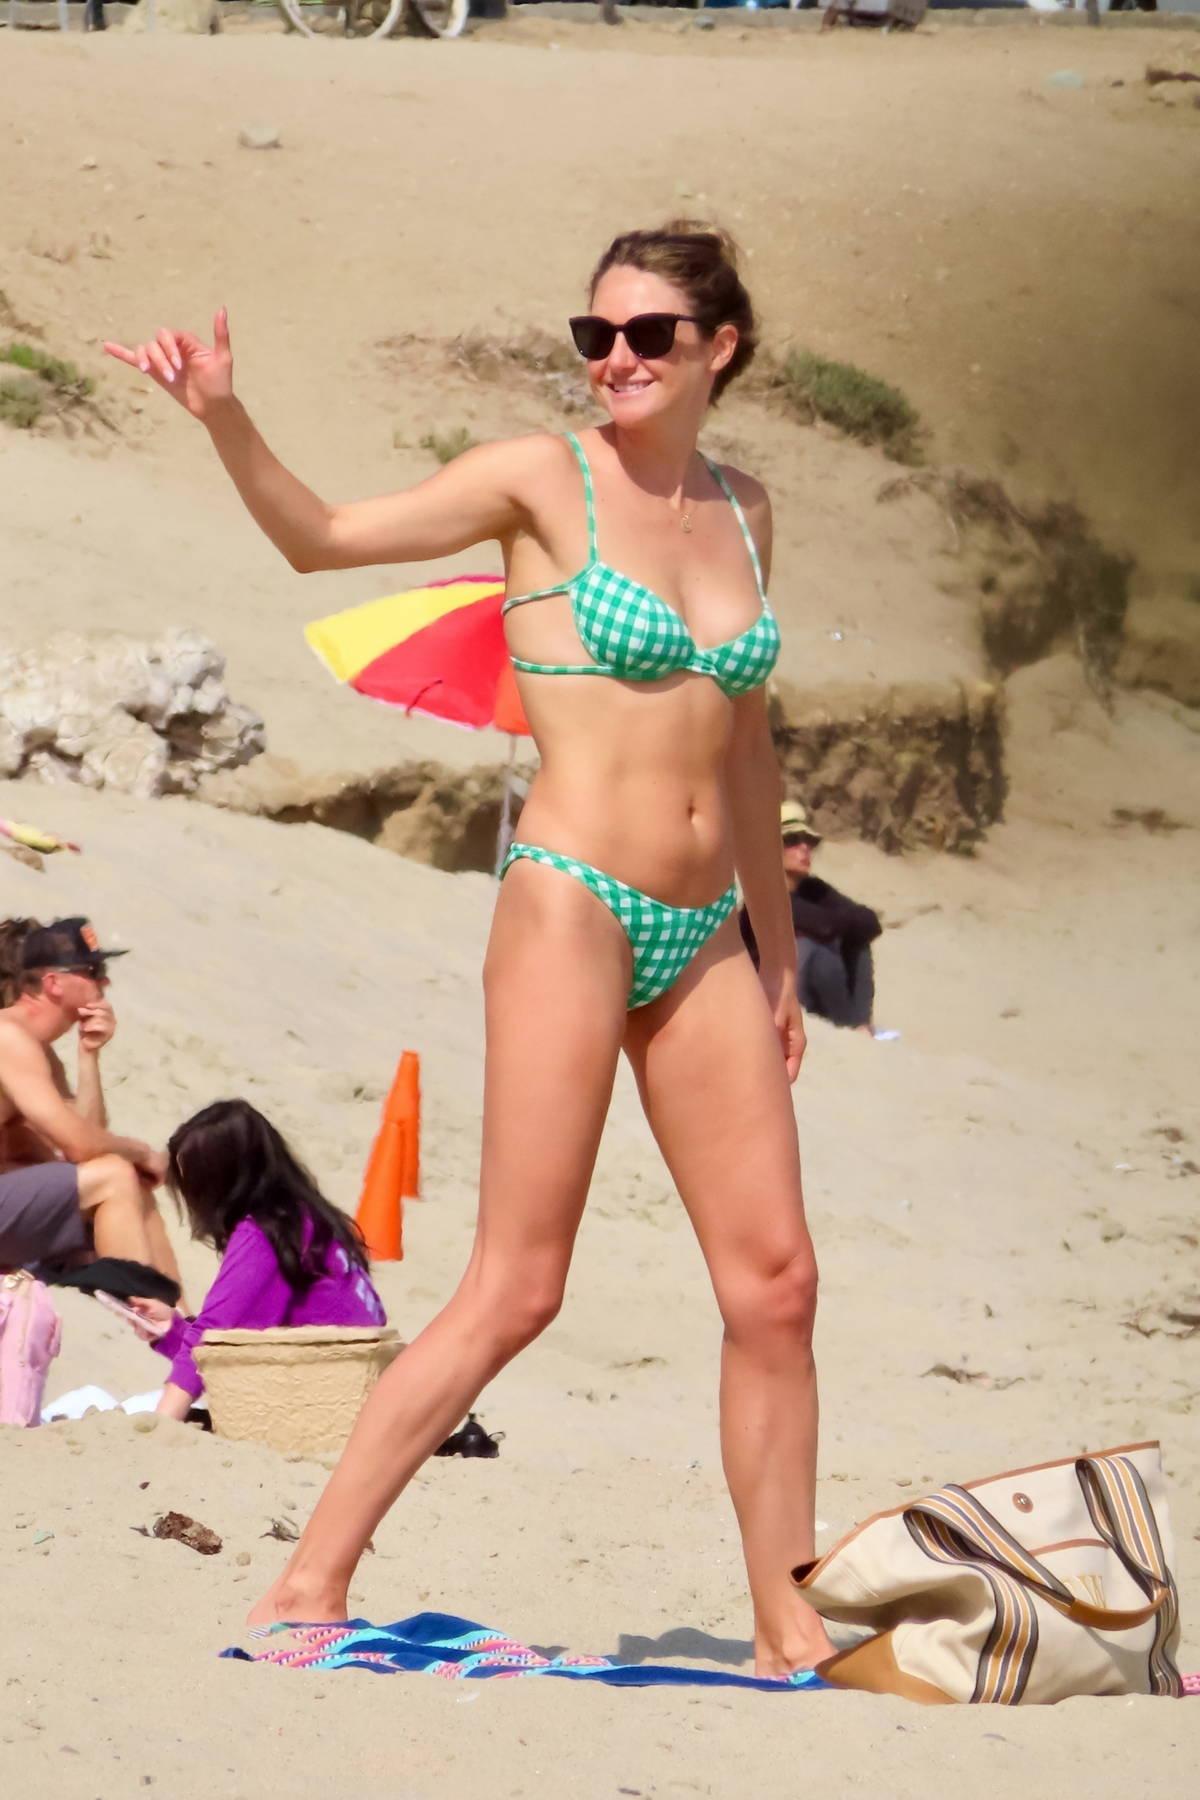 Shailene Woodley looks incredible in a green gingham bikini while enjoying a beach day in Malibu, California